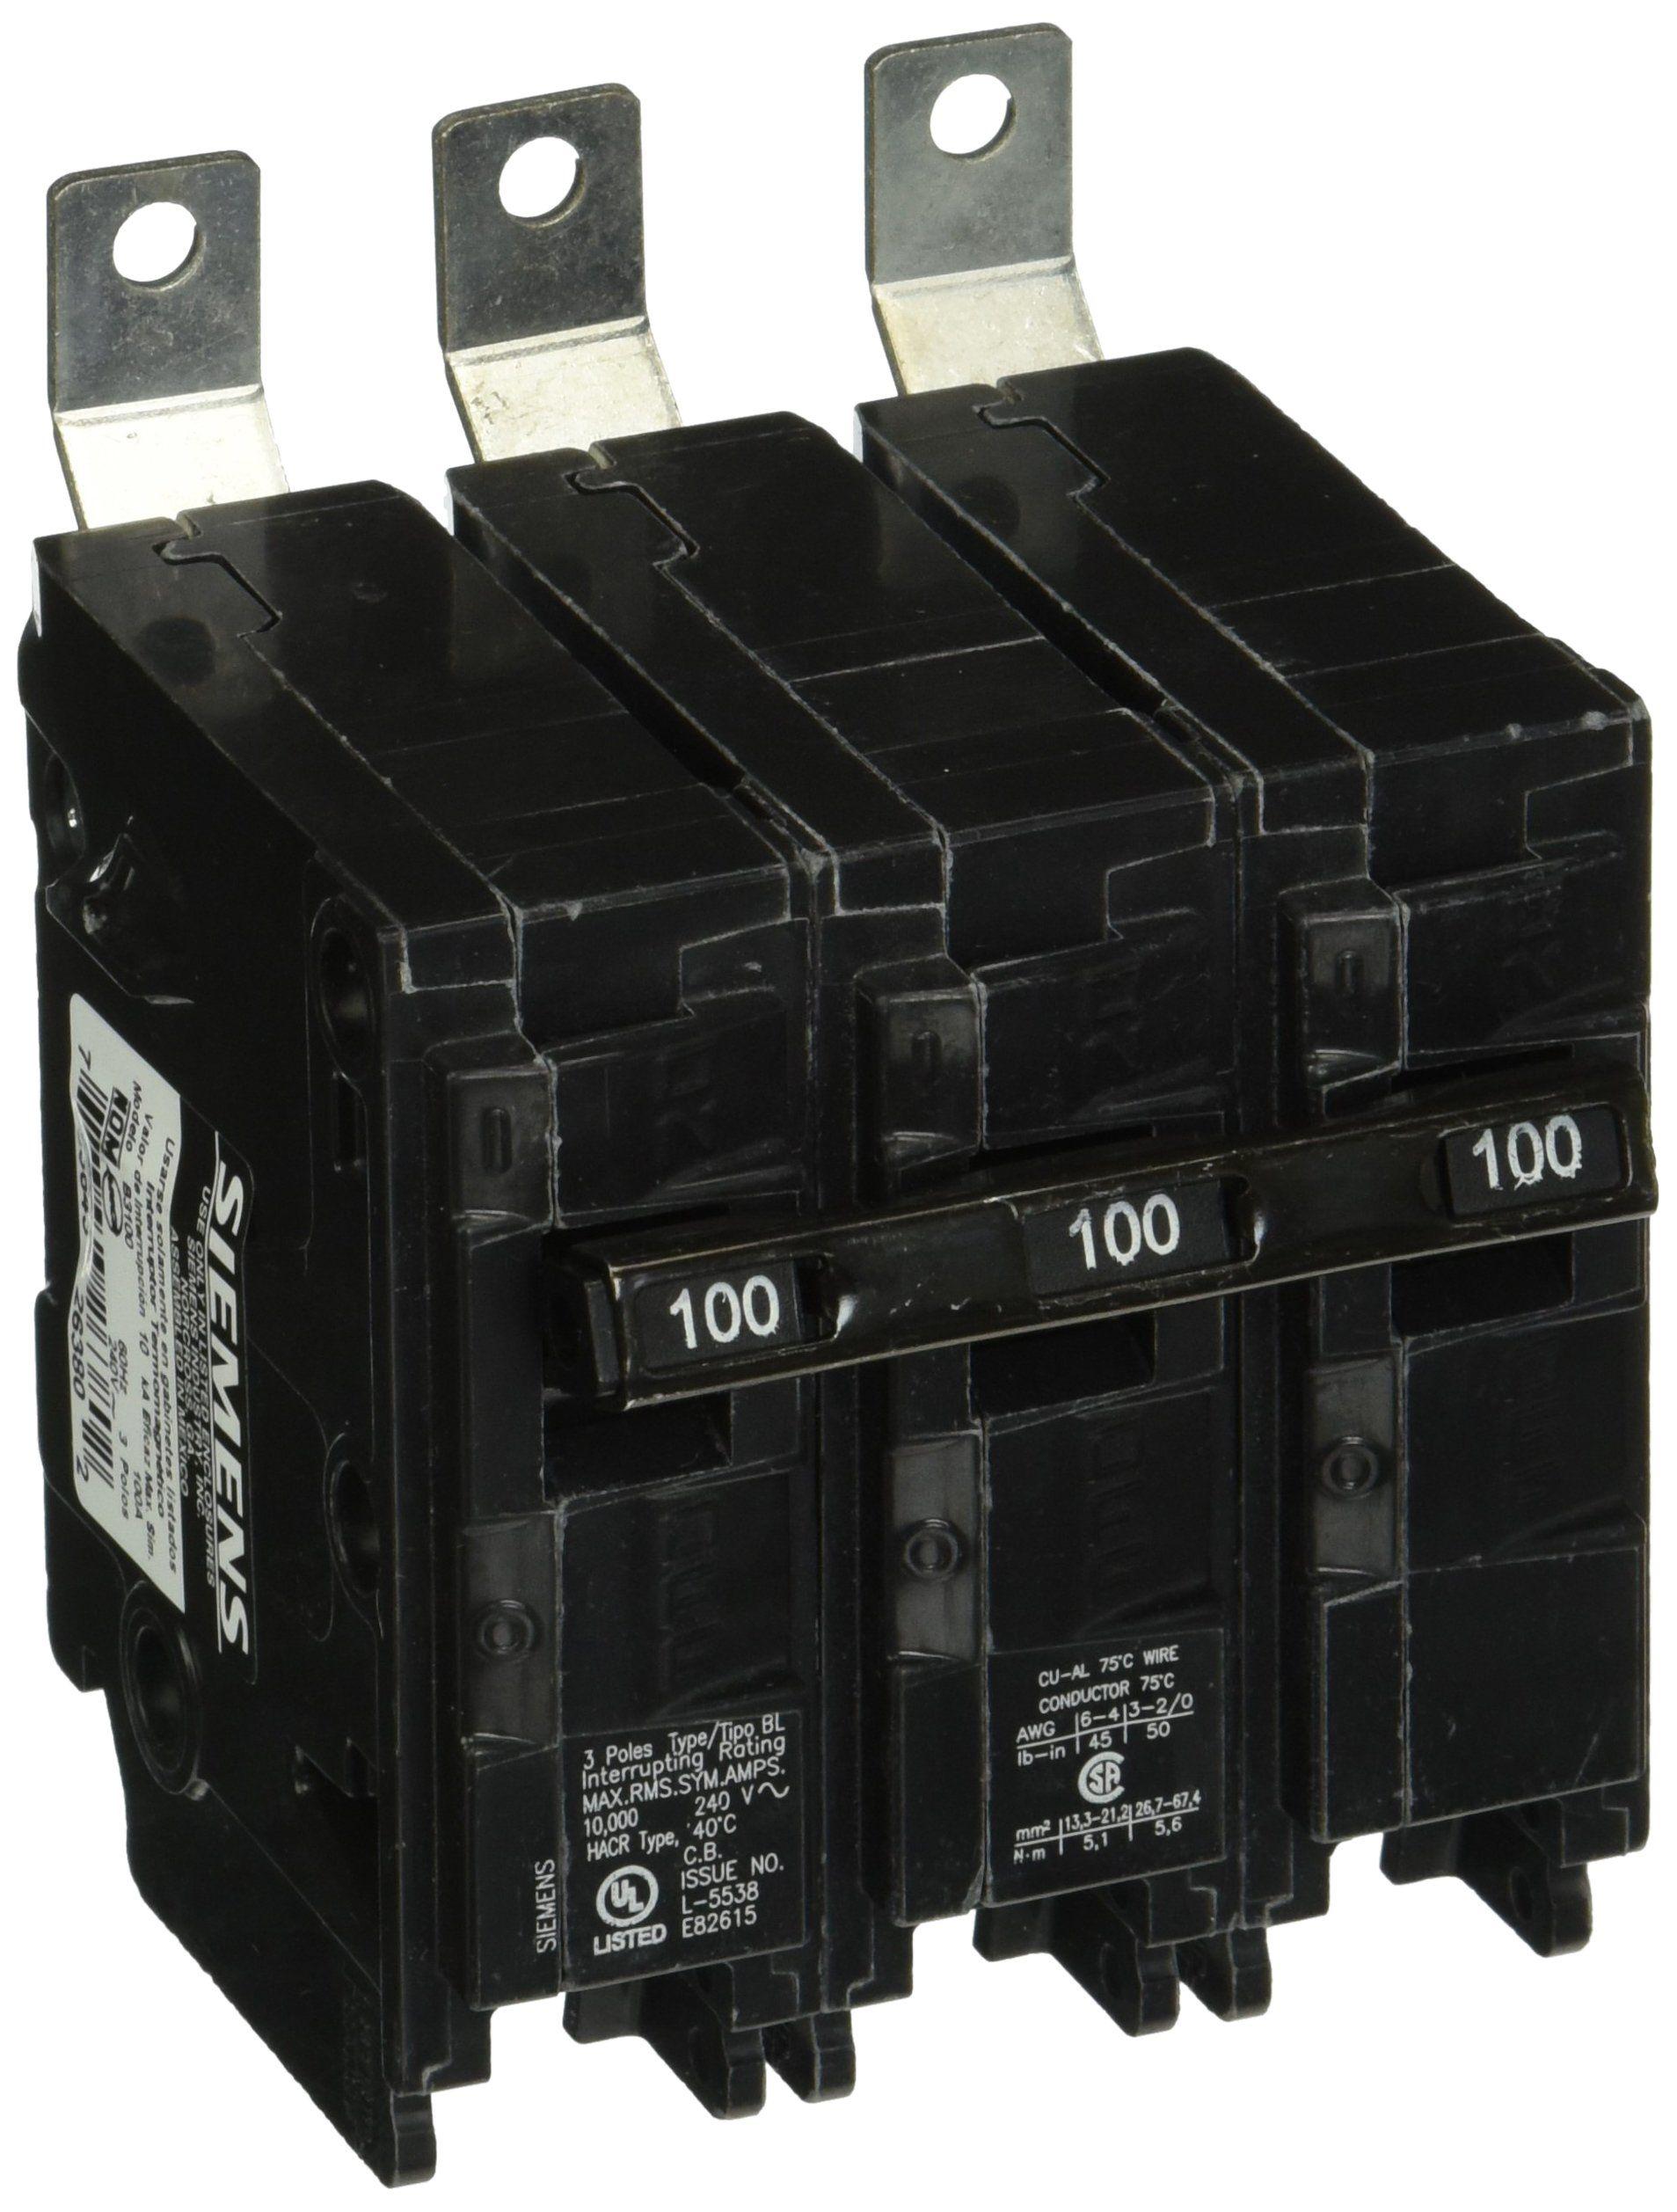 Siemens B3100 100 Amp Three Pole 240 Volt 10kaic Bolt In Breaker